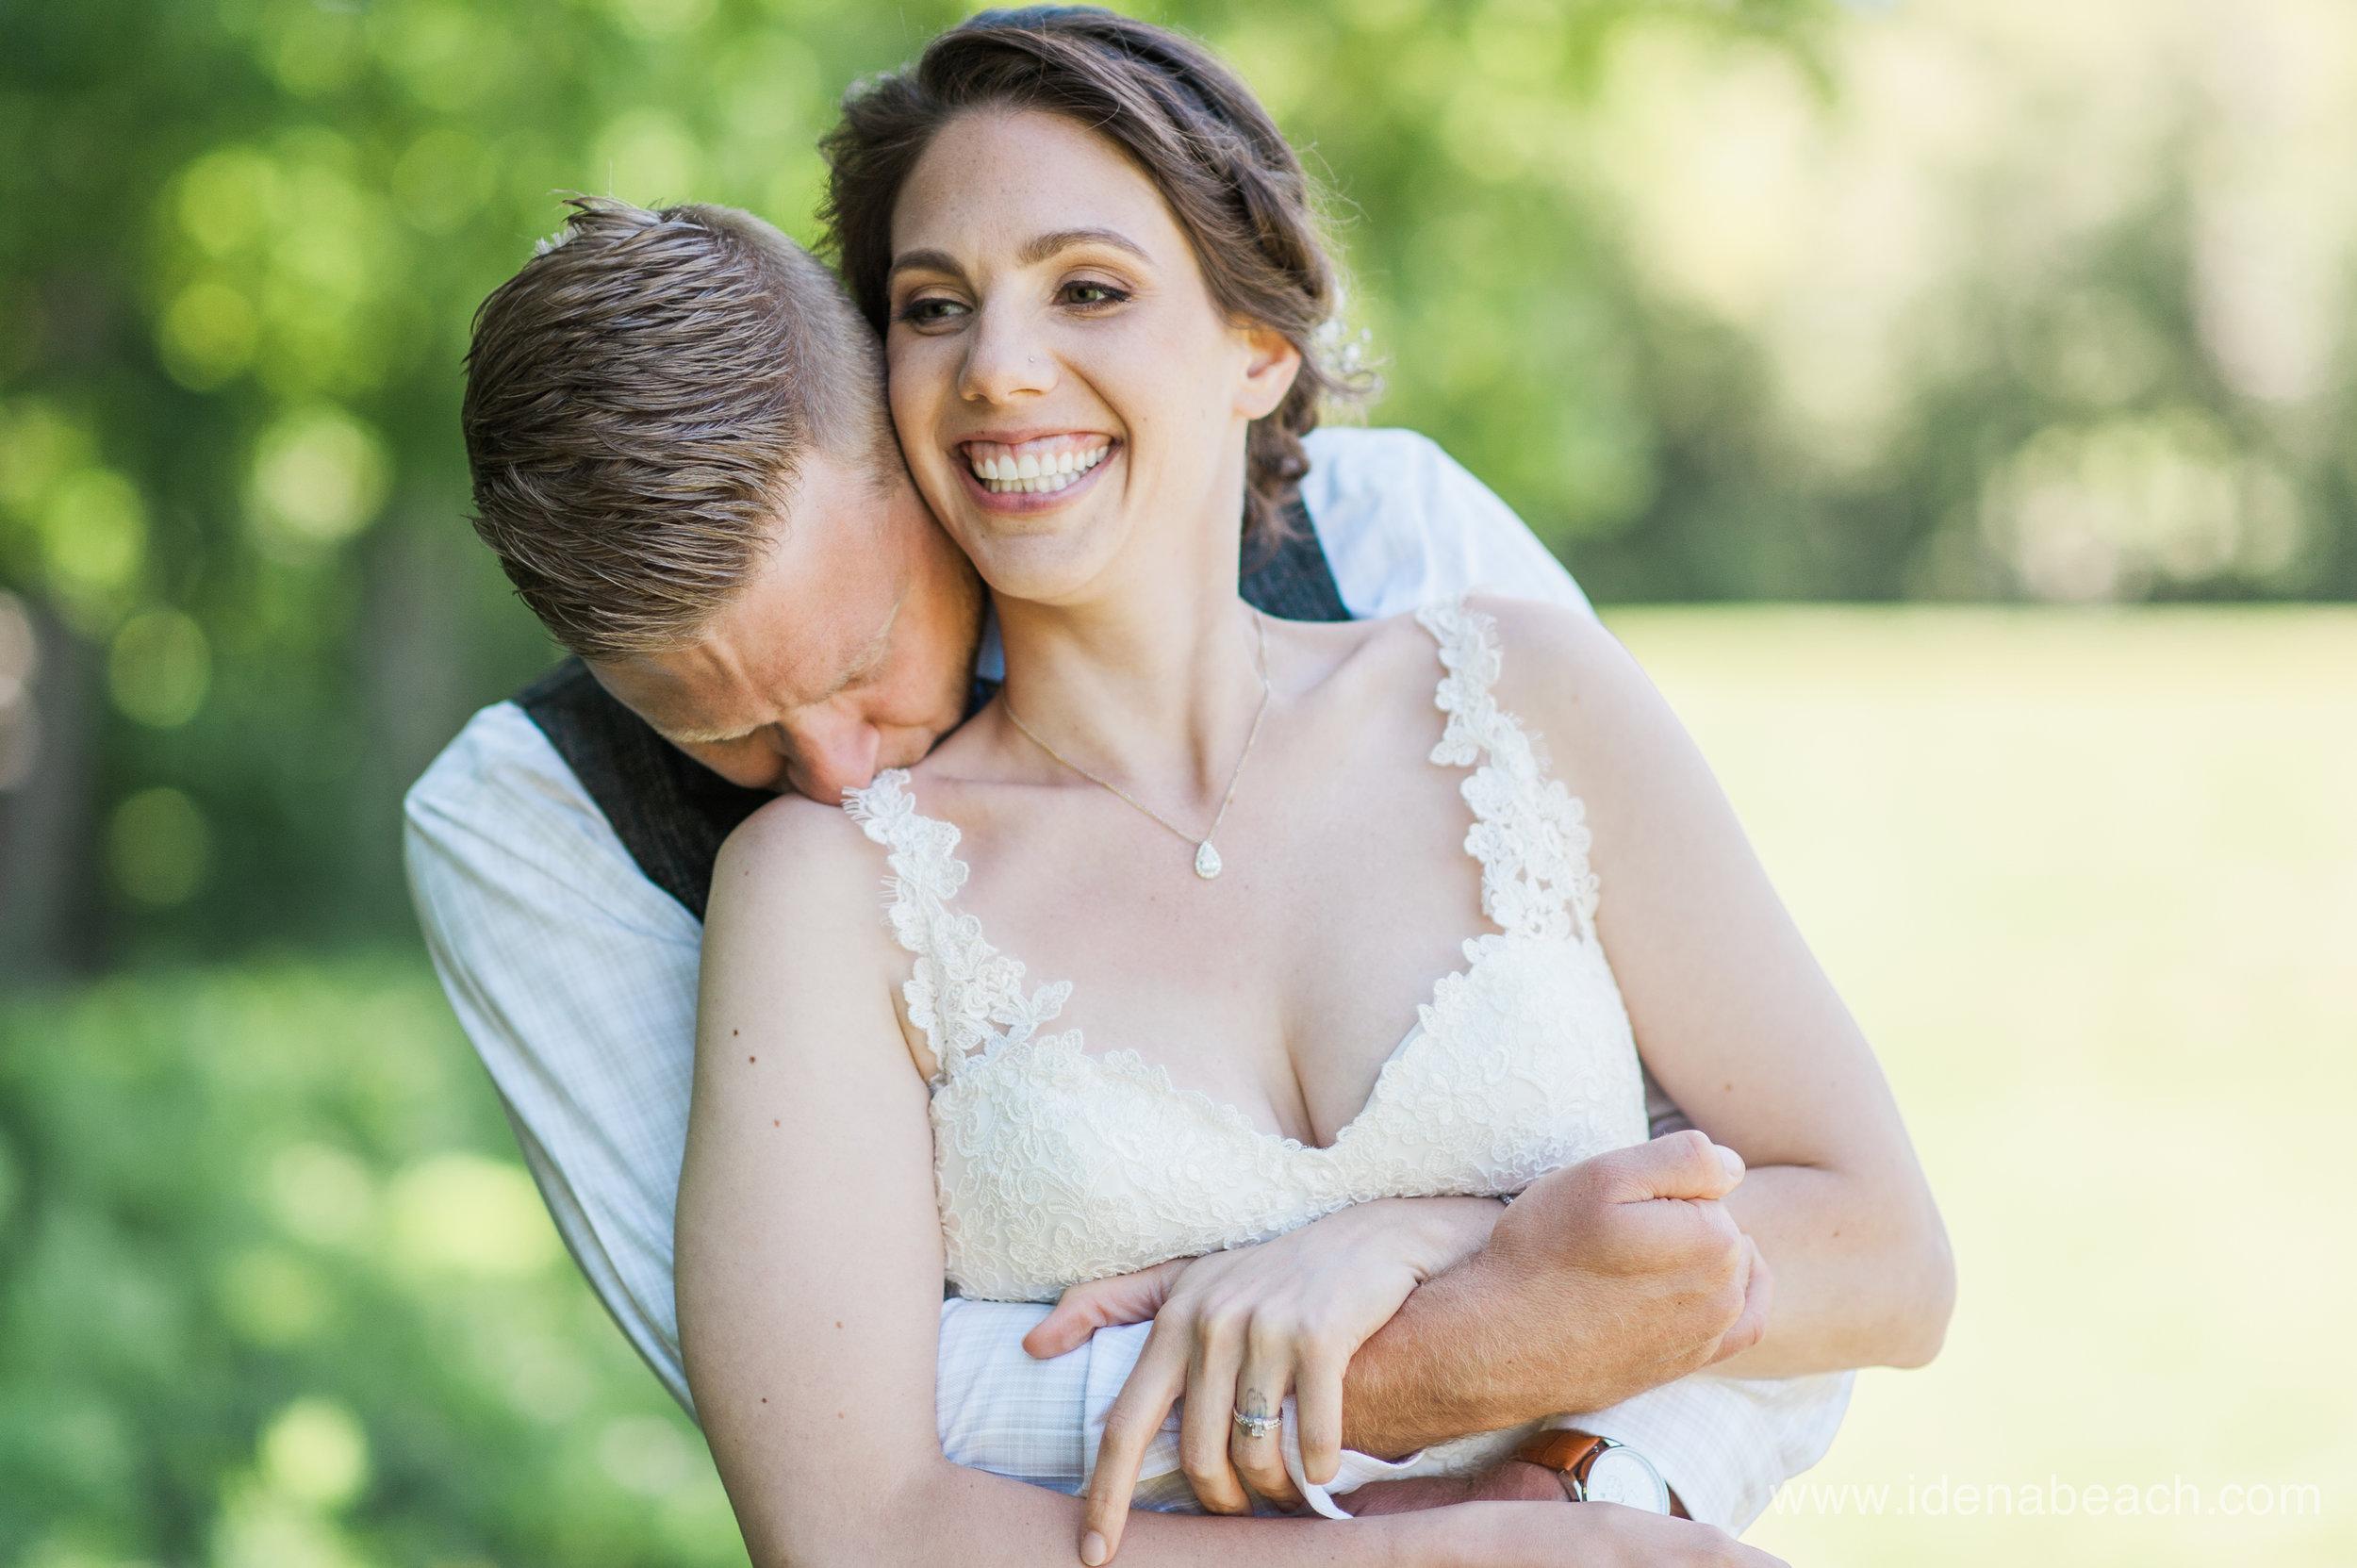 IdenaBeach-Vermont-Wedding-Photographer-Mountain-Top-Inn-56.jpg